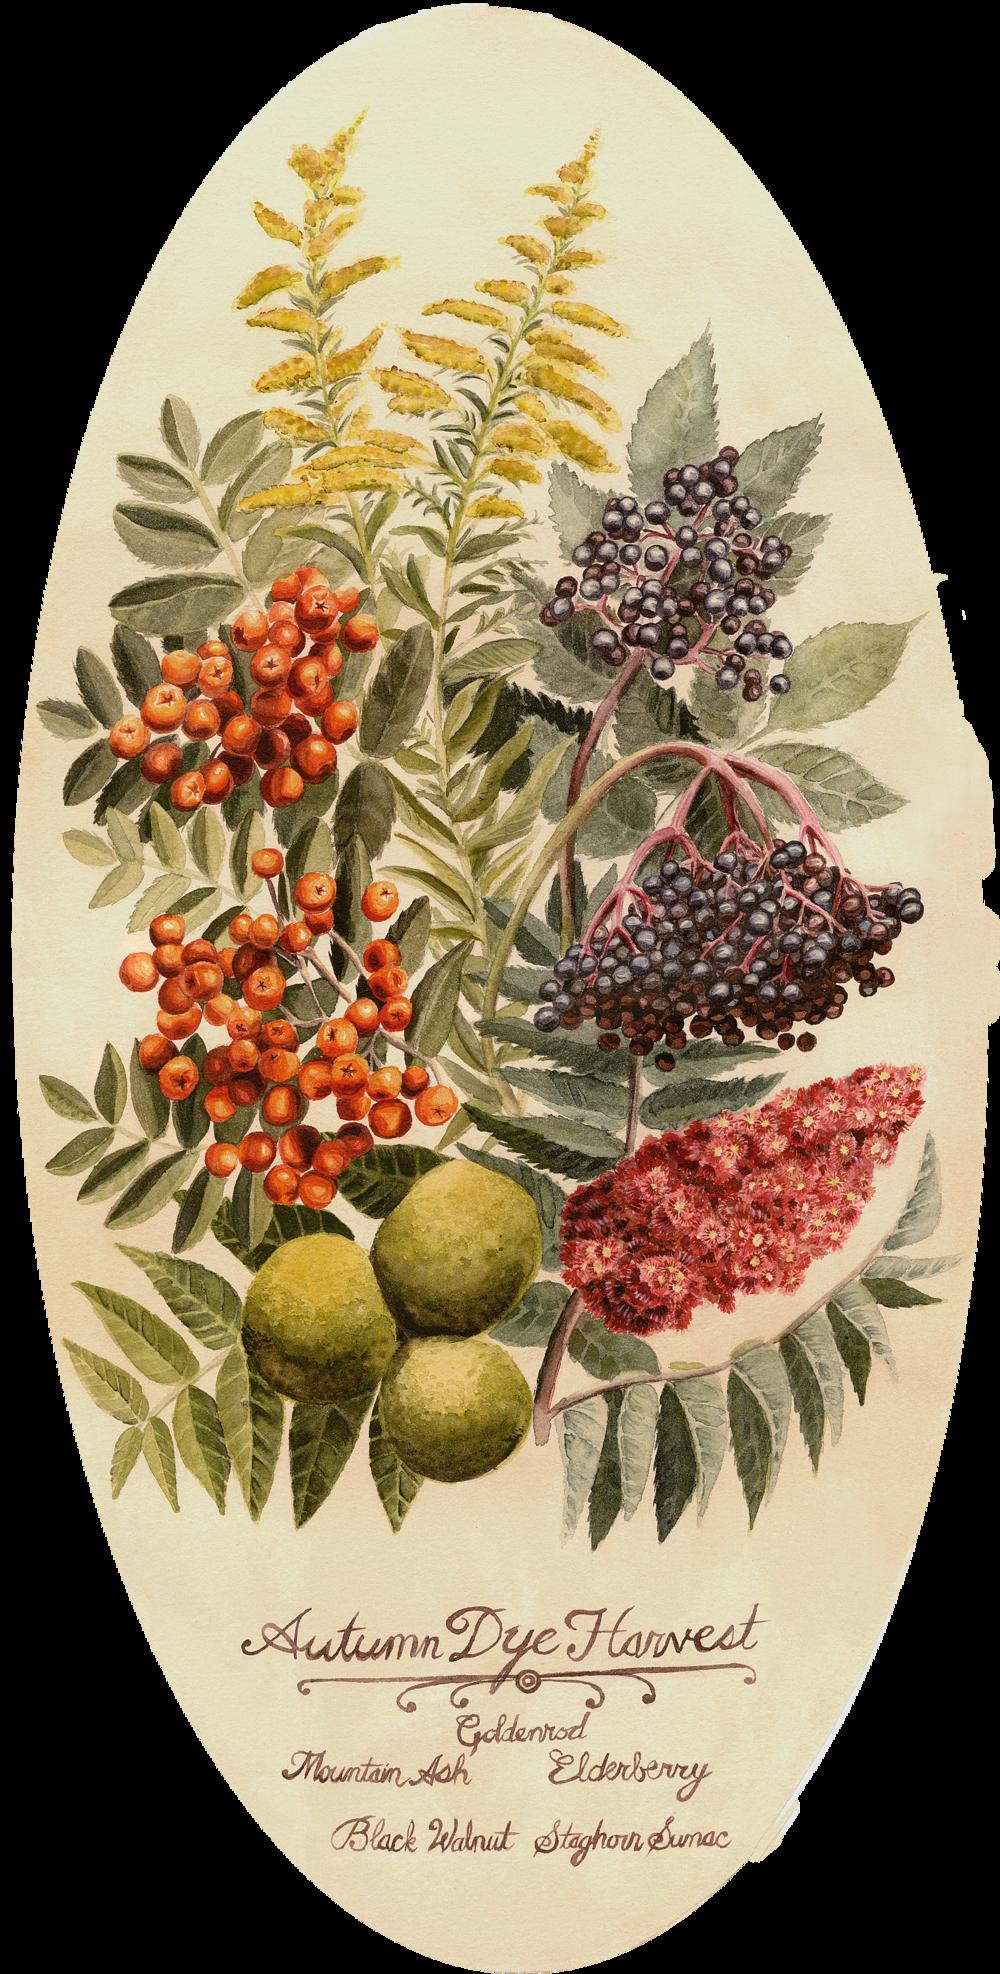 Autumn Dye Harvest